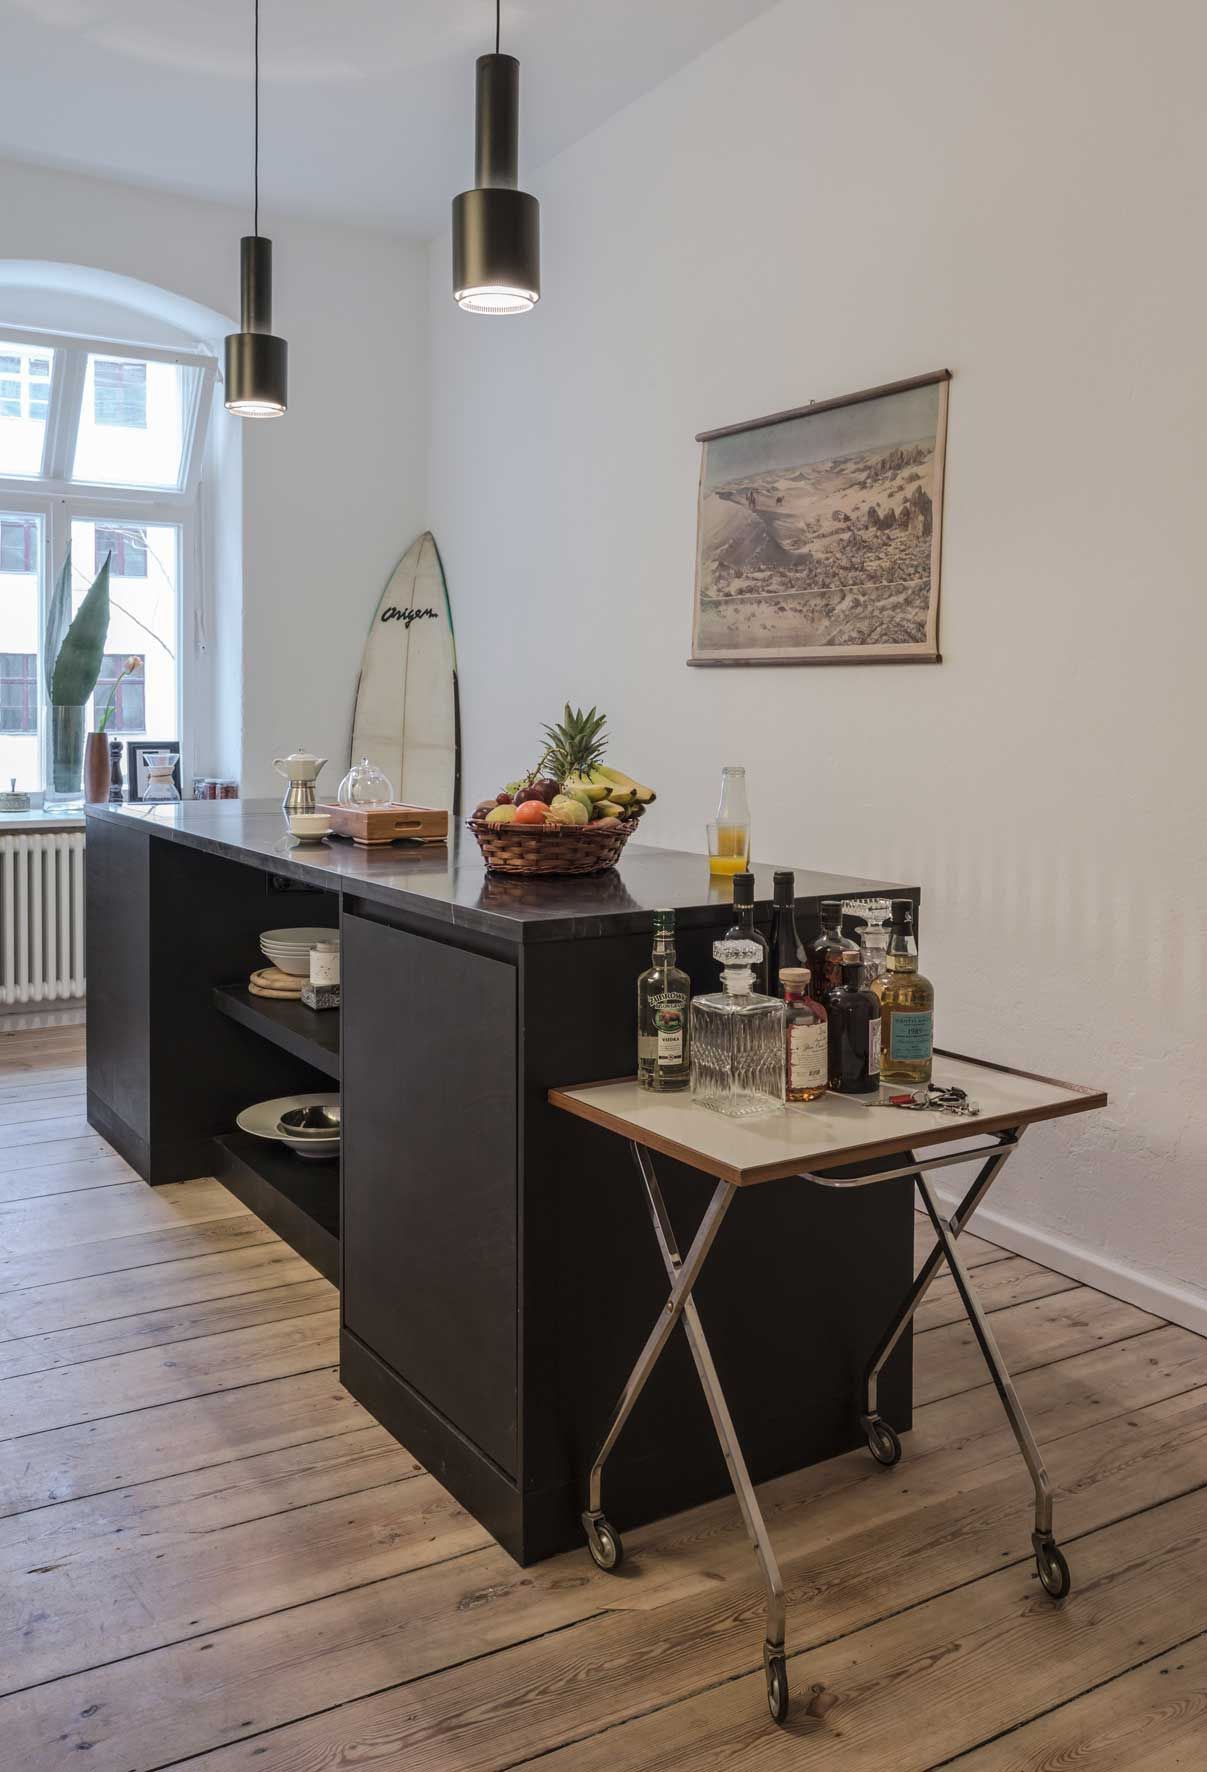 FvF Apartment Berlin by Freunde von Freunde and Vitra ...